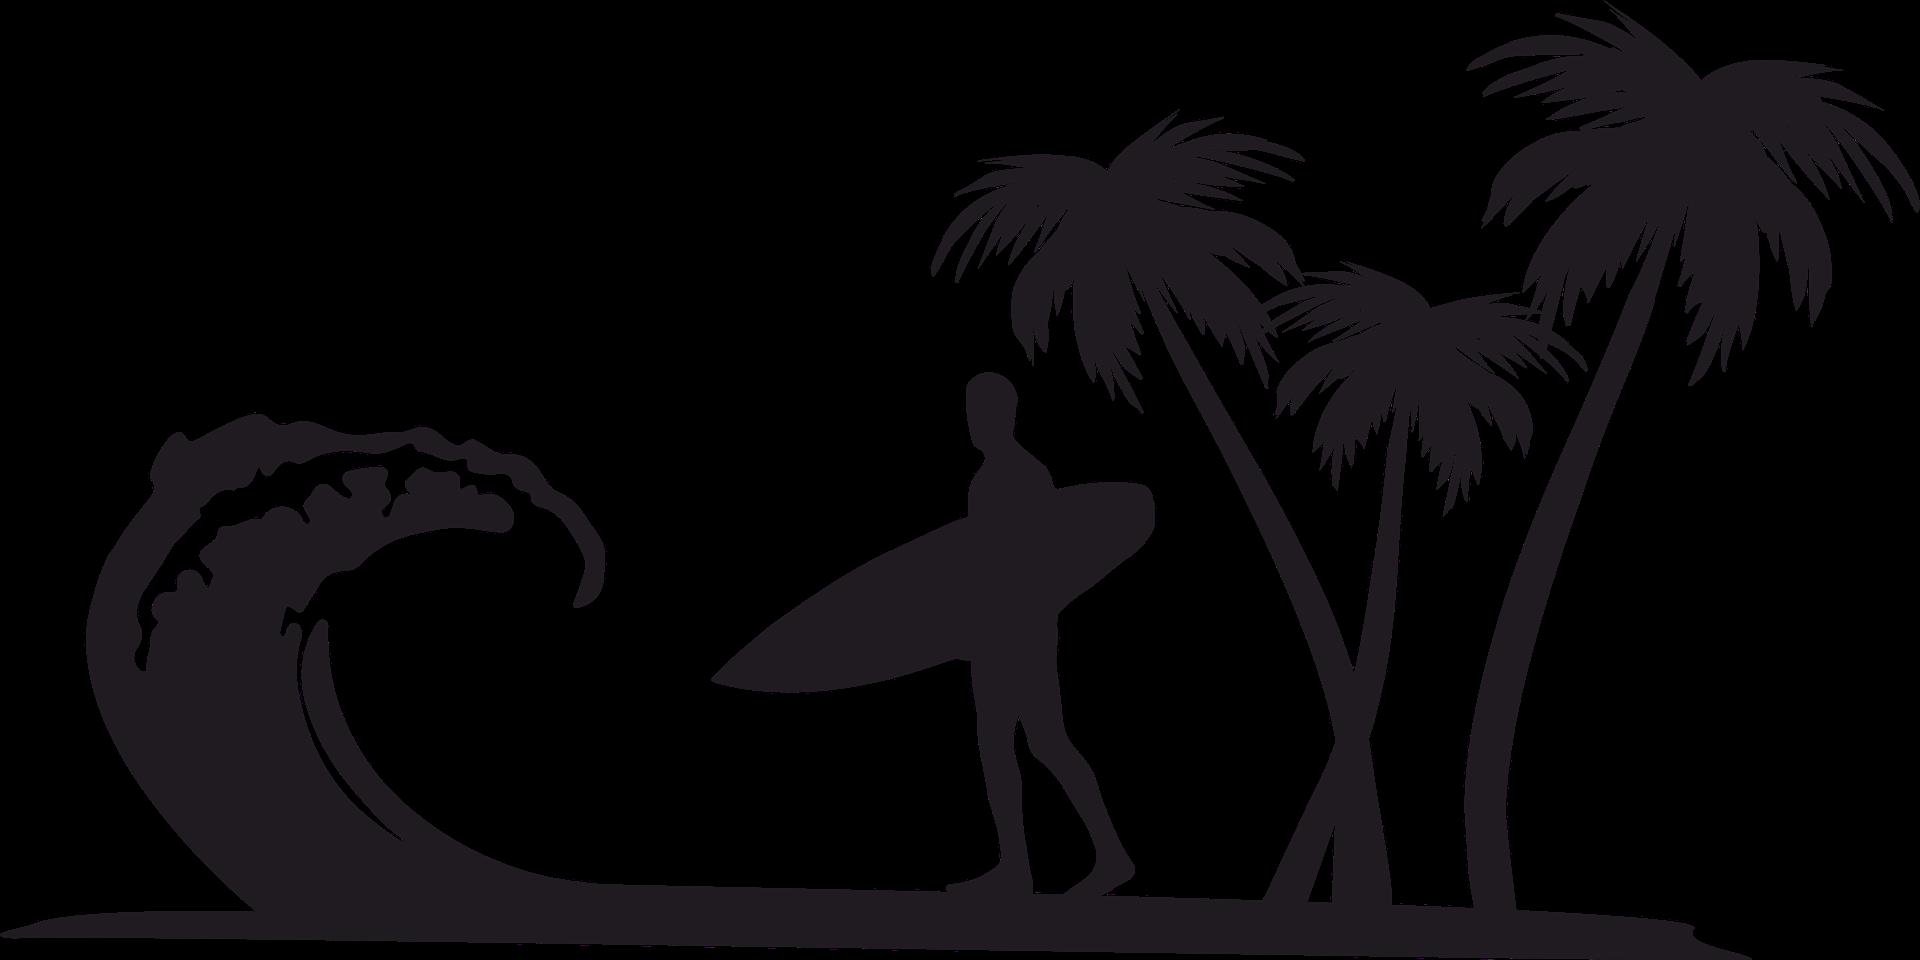 Clip art Openclipart Surfing Palm trees Desktop Wallpaper.